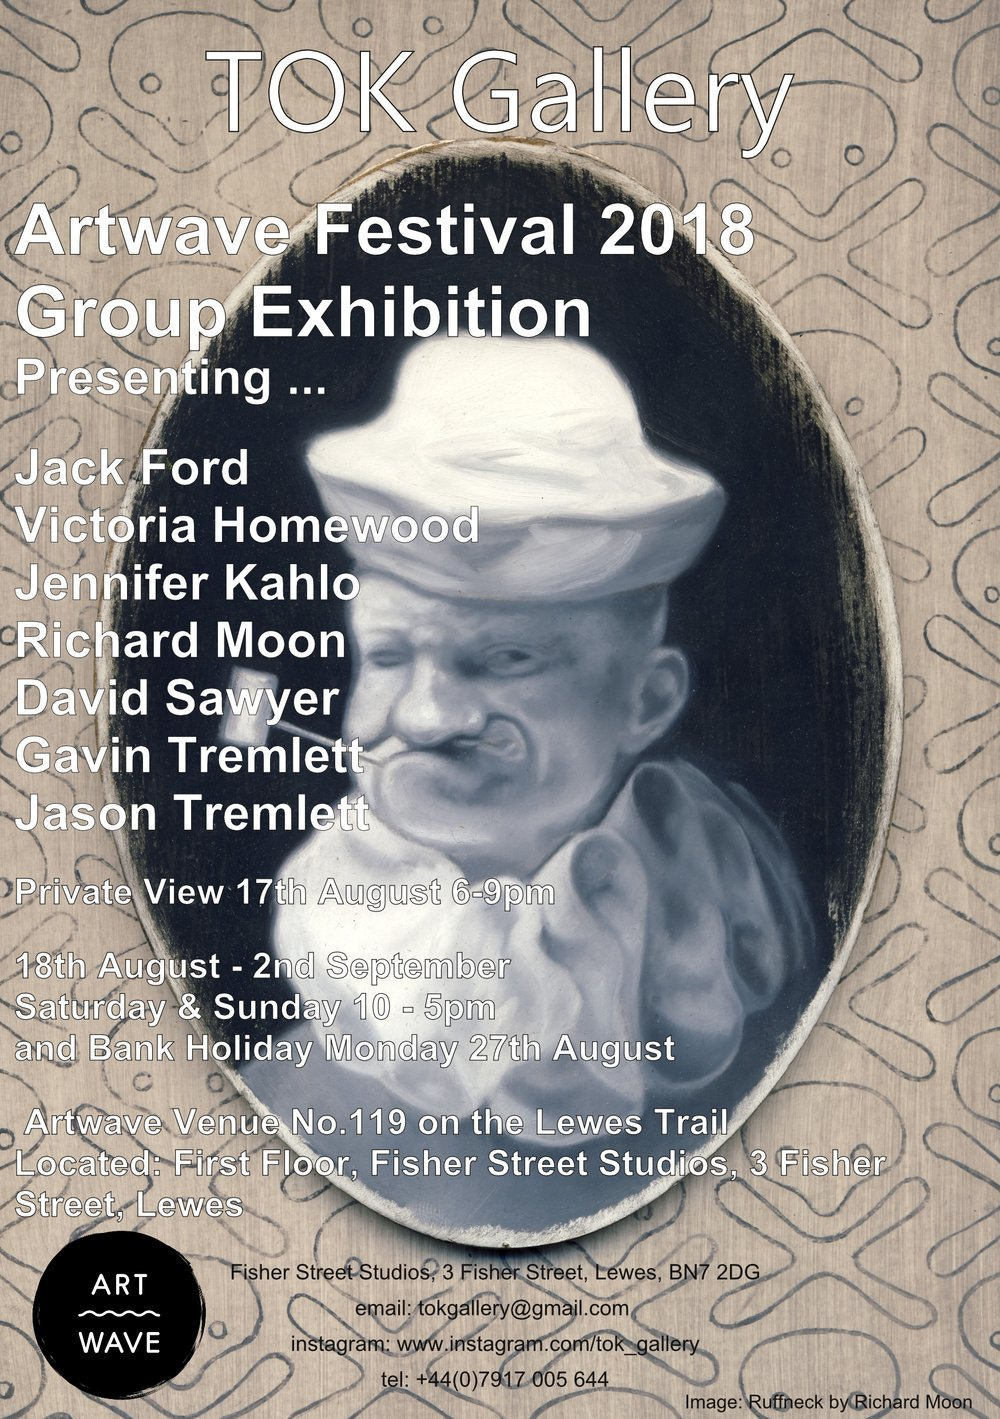 Poster - Gallery - Artwave 2018 MOON-page001.jpg